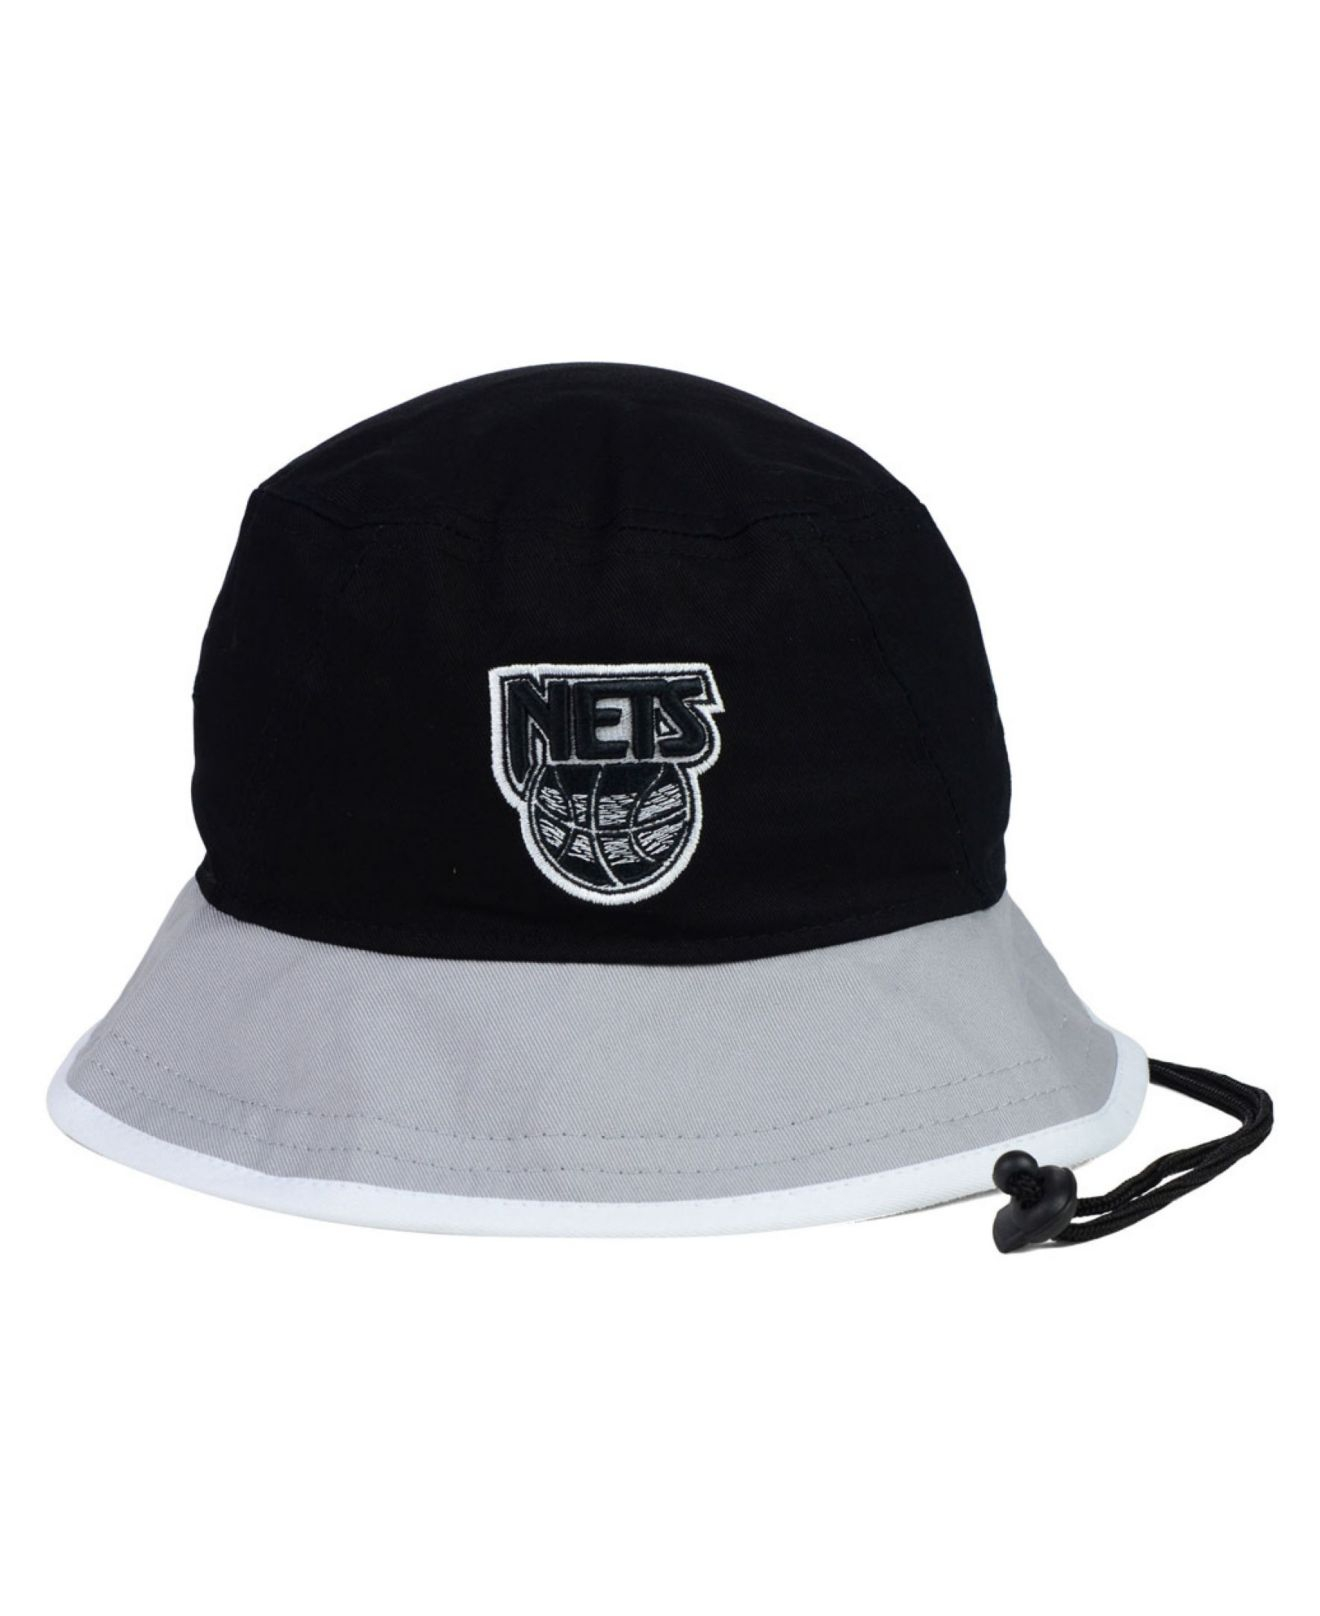 Lyst - KTZ New Jersey Nets Black-top Bucket Hat in Black for Men daa8f1d70753